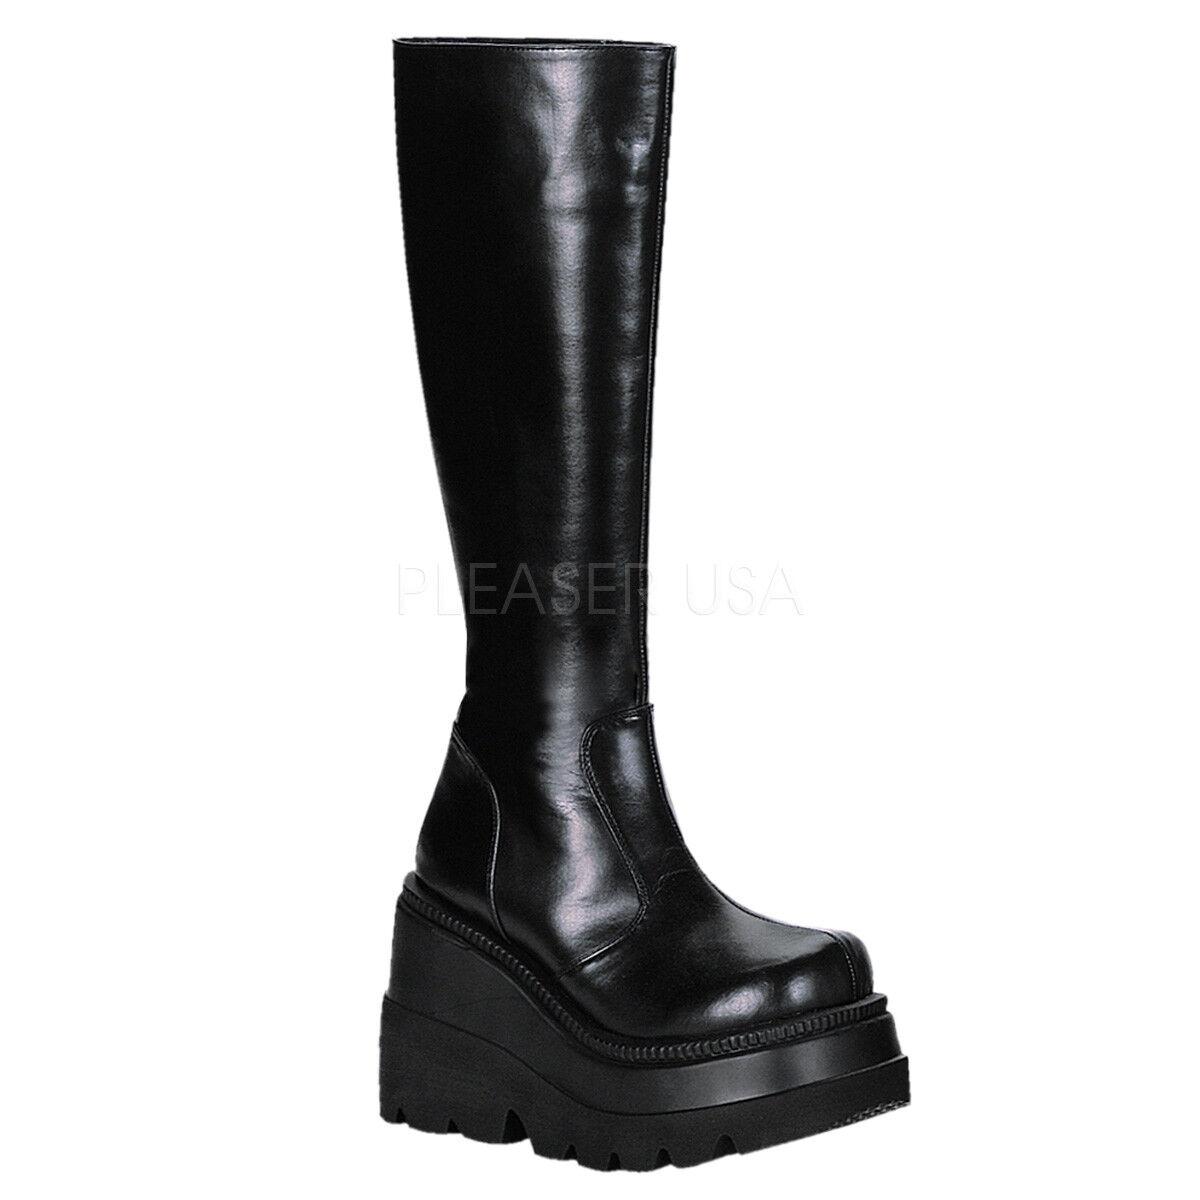 Demonia SHAKER-100 Women's Black Vegan Leather Platform Punk Lolita Knee Hi Boot